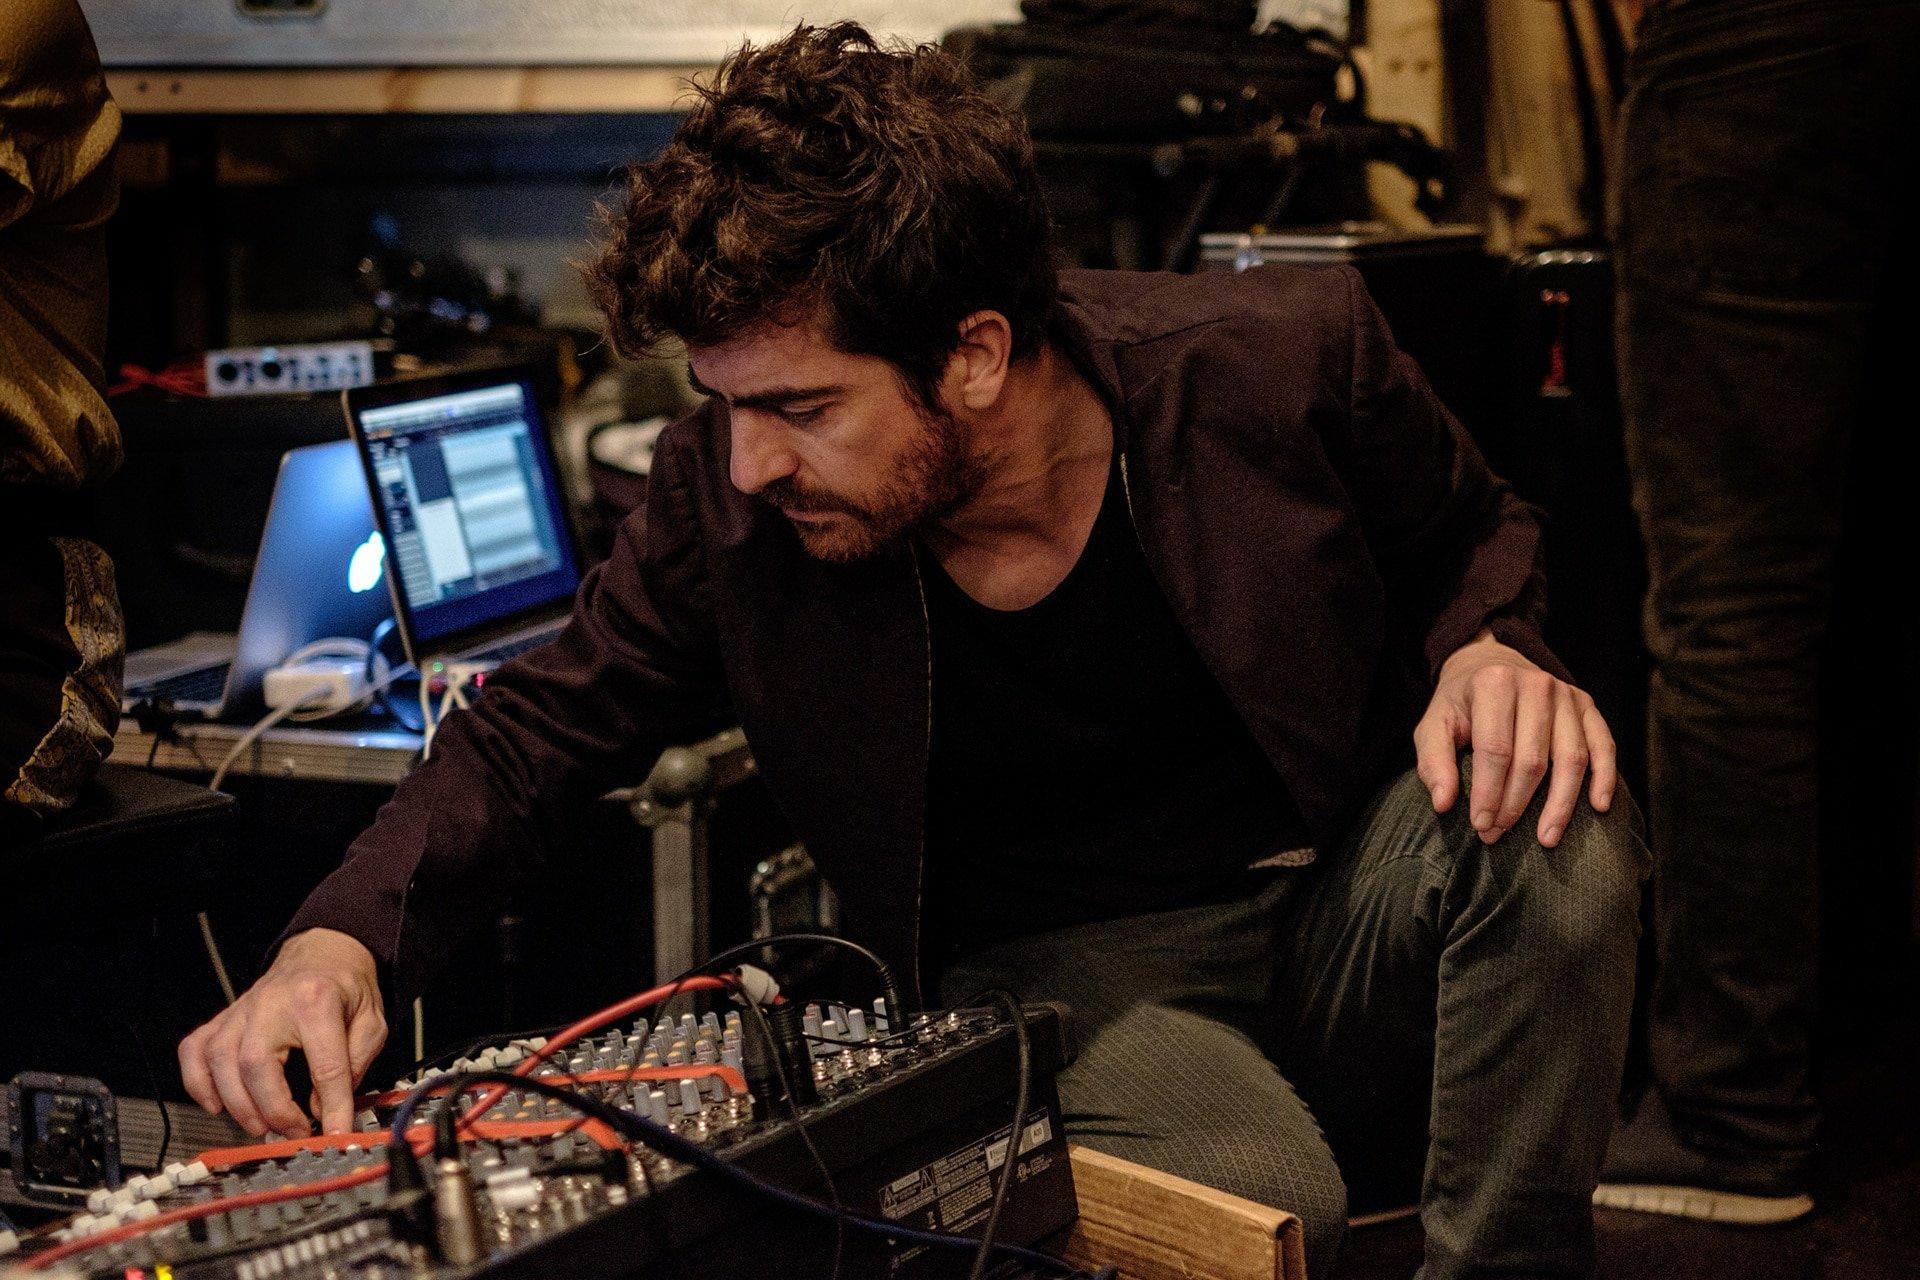 composer Mauricio Pauly